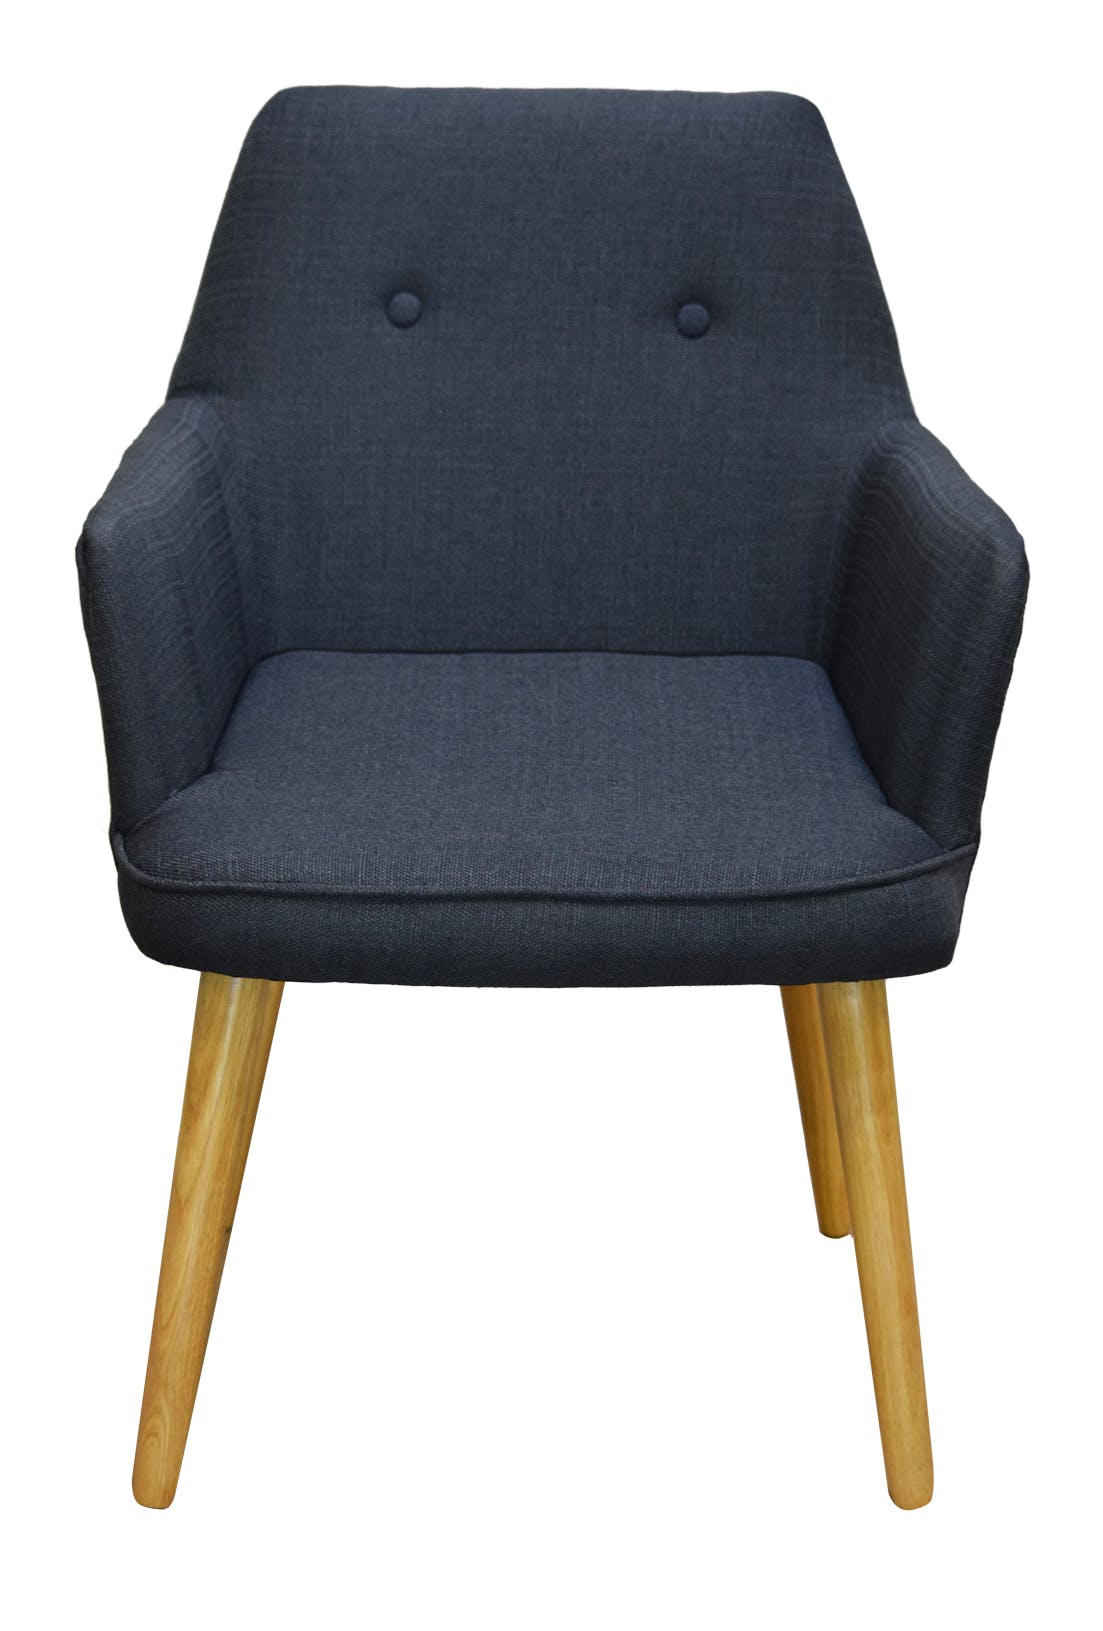 Fauteuil de table scandinave gris OSLO